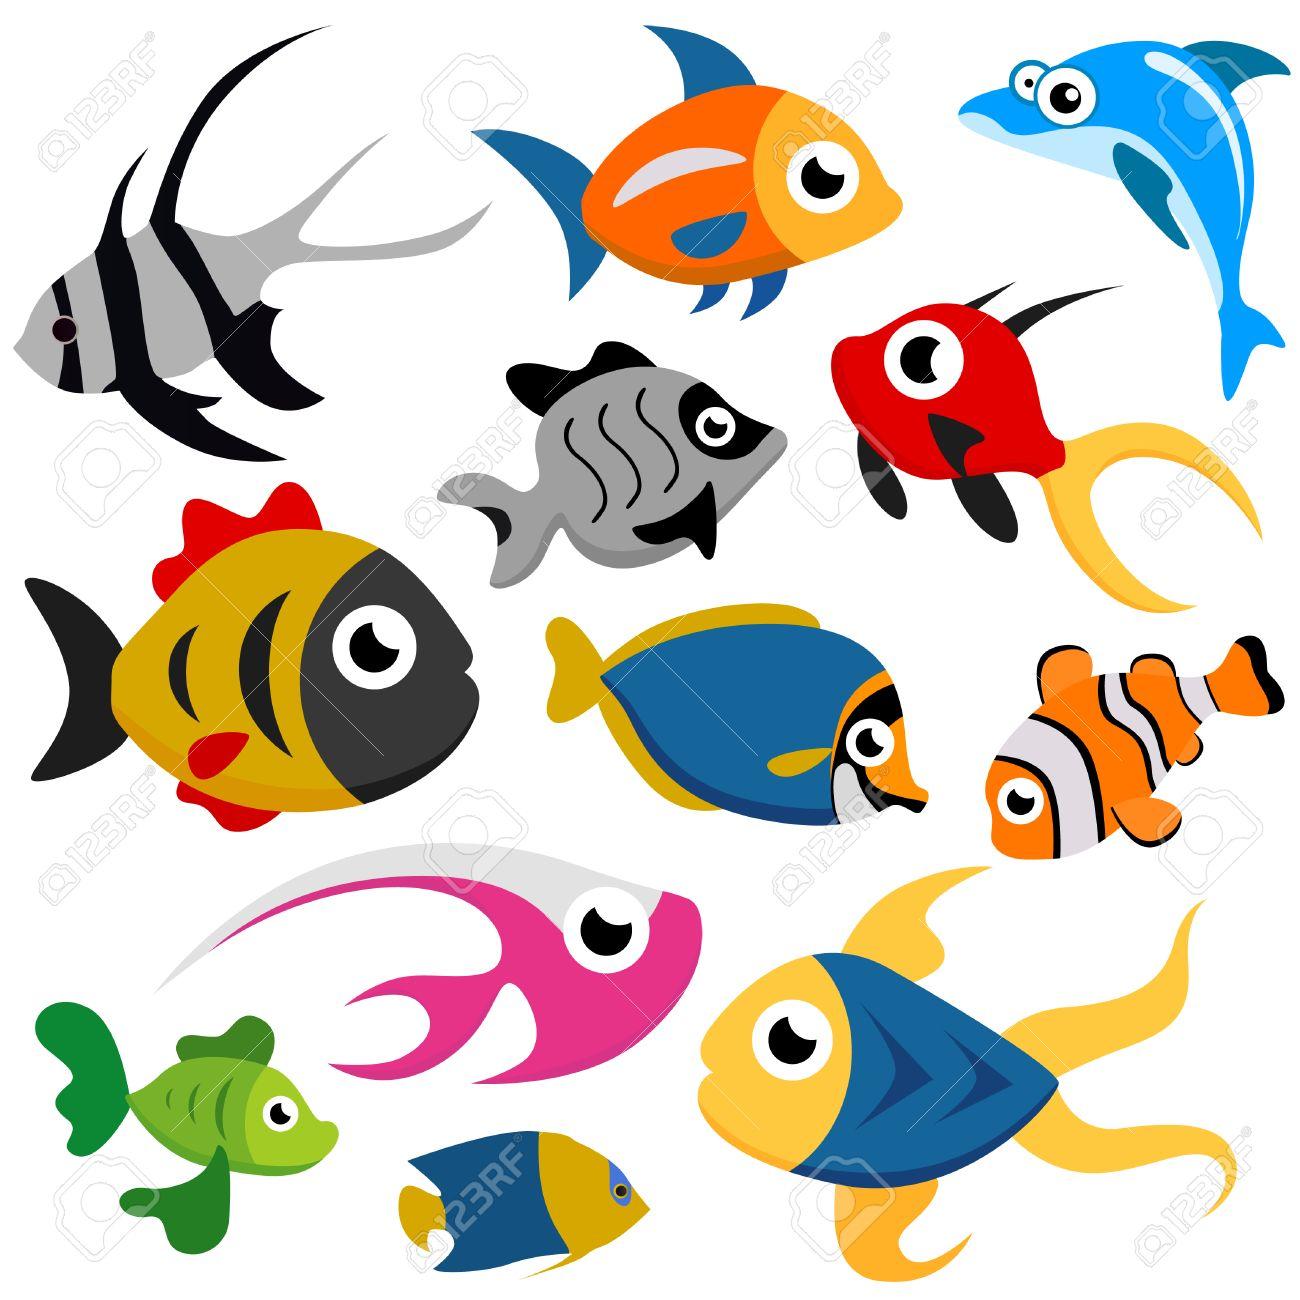 Banco Peces Dibujo de Dibujos Animados Peces